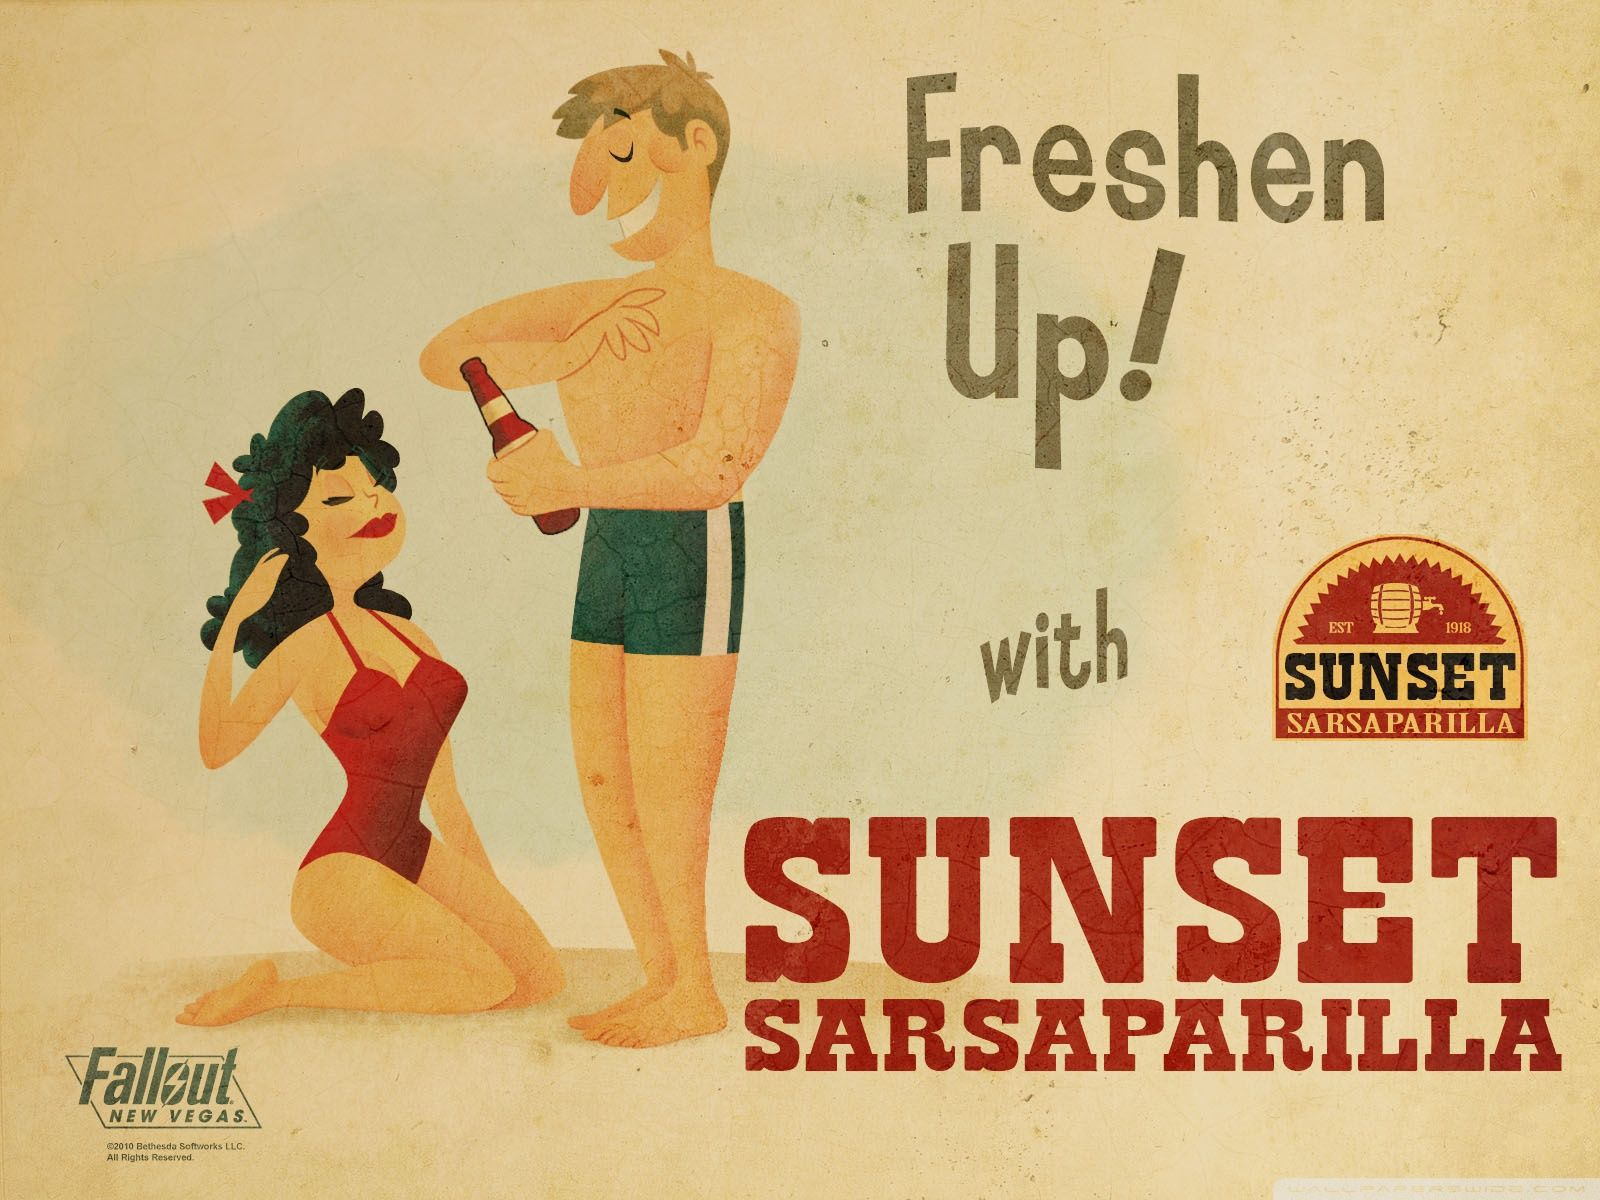 sunset_sarsaparilla___fallout_new_vegas-wallpaper-1600x1200.jpg